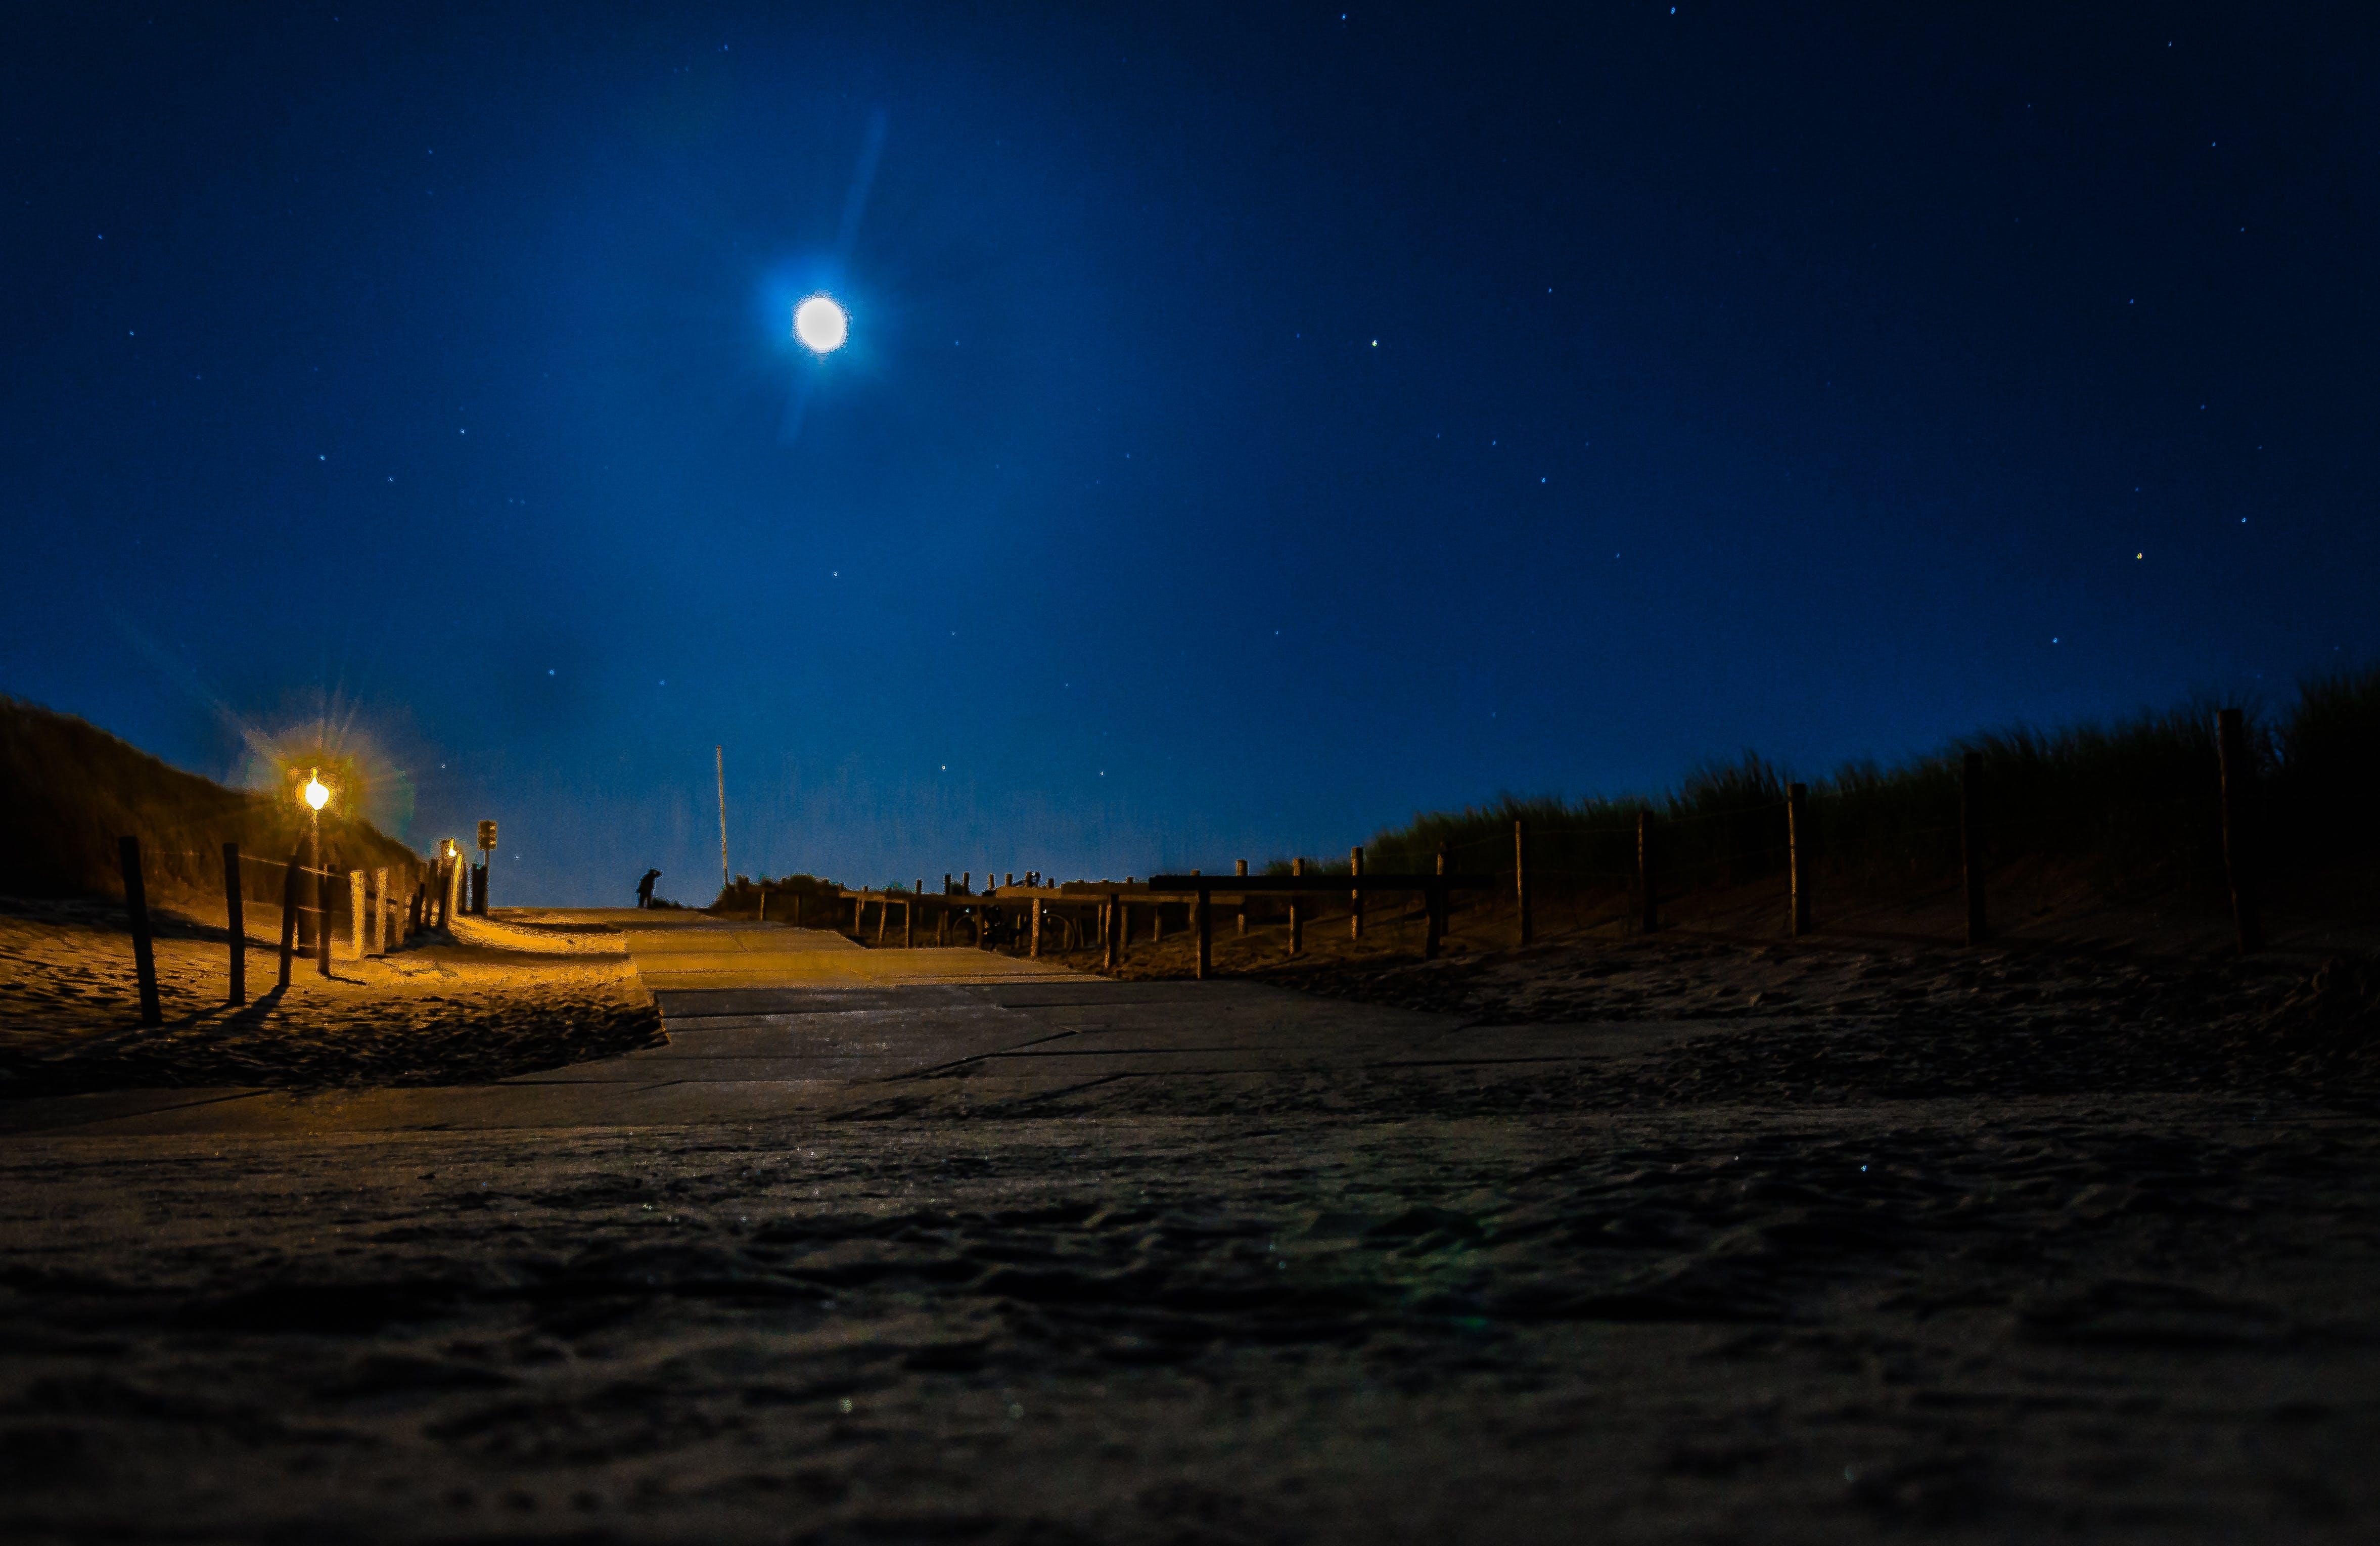 Scenic View at Night